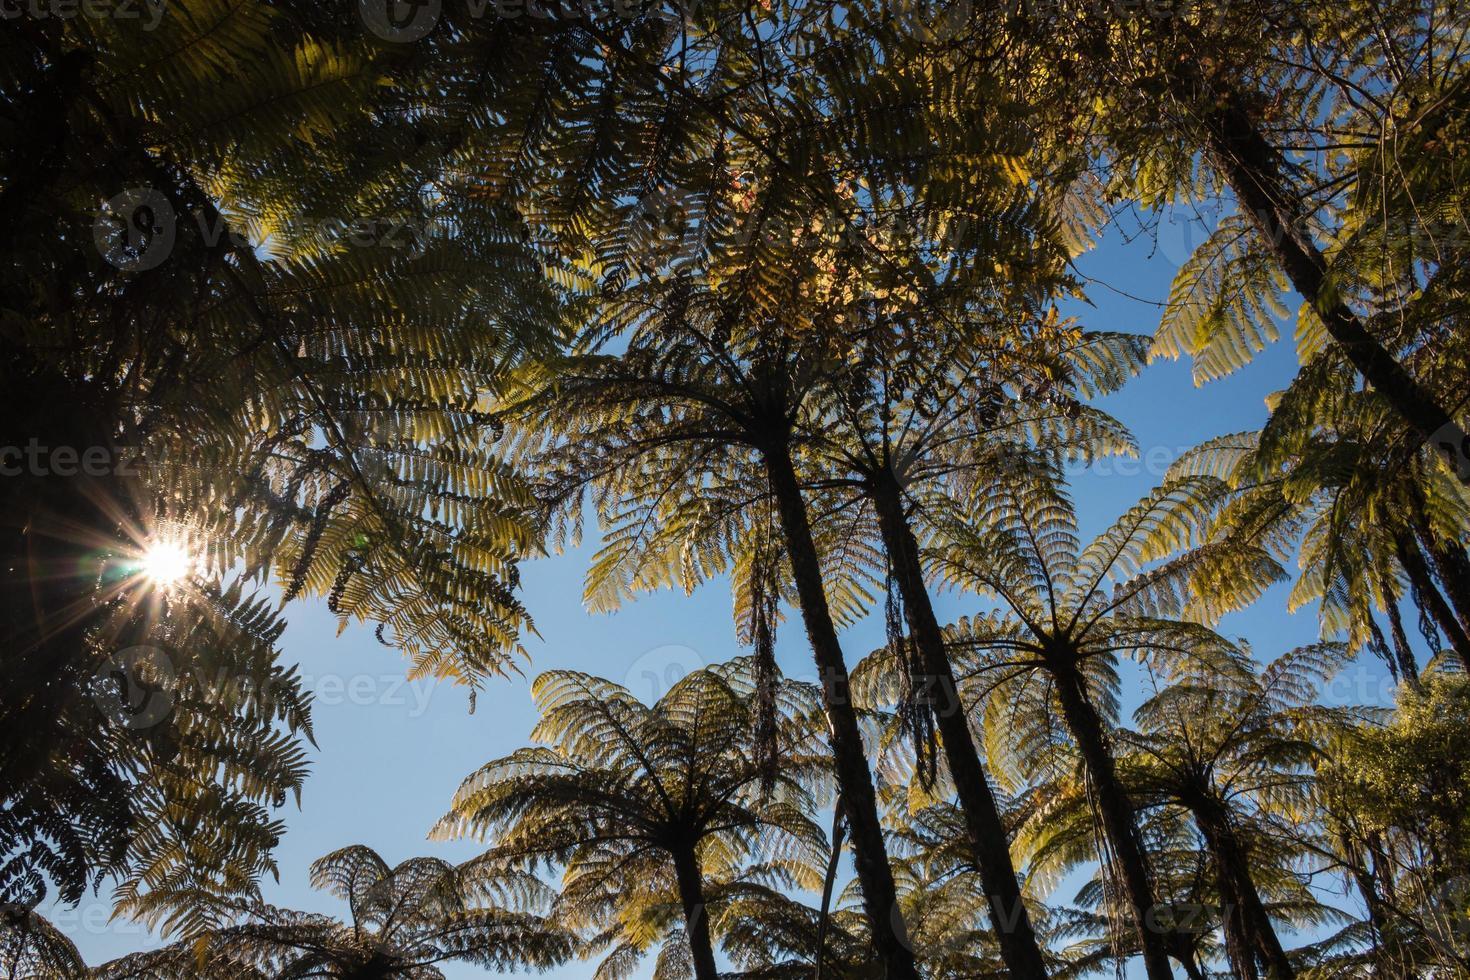 black tree fern forest photo